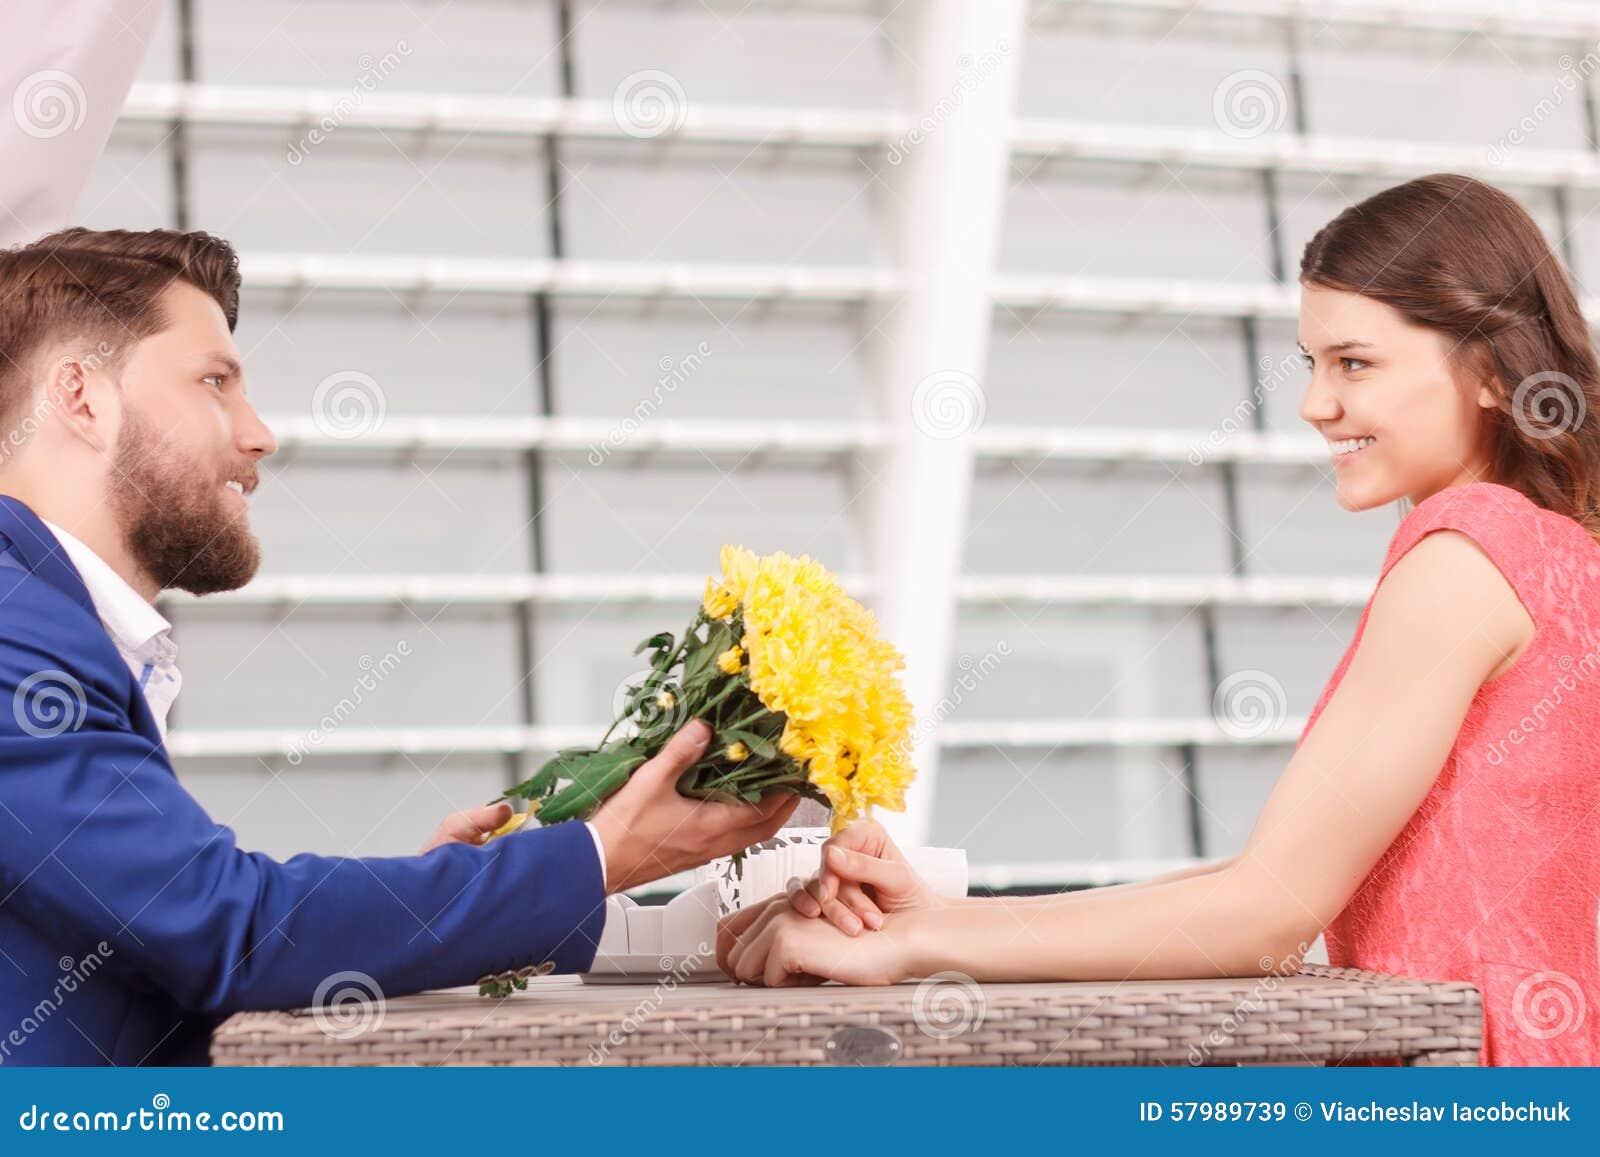 Handsome man giving flowers to his girlfriend stock image image of handsome man giving flowers to his girlfriend mightylinksfo